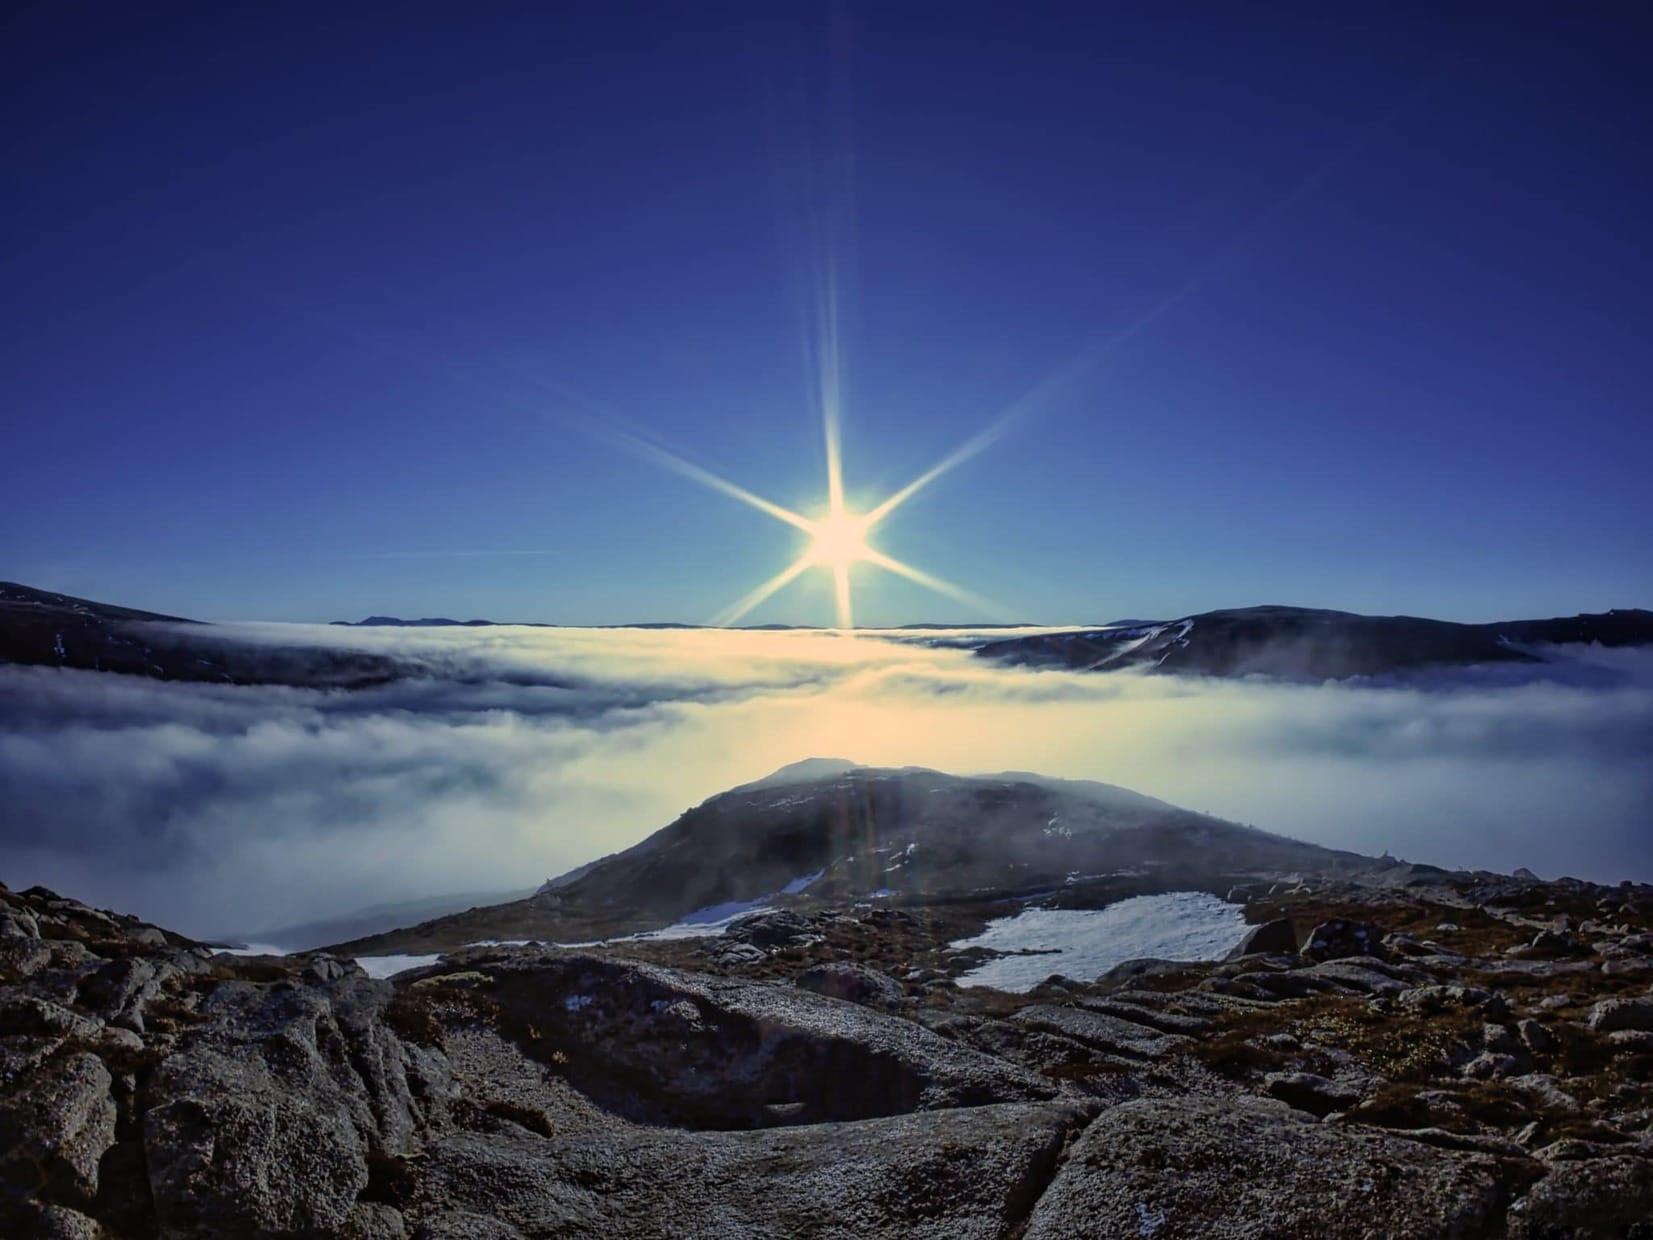 Glen Lui Inversion